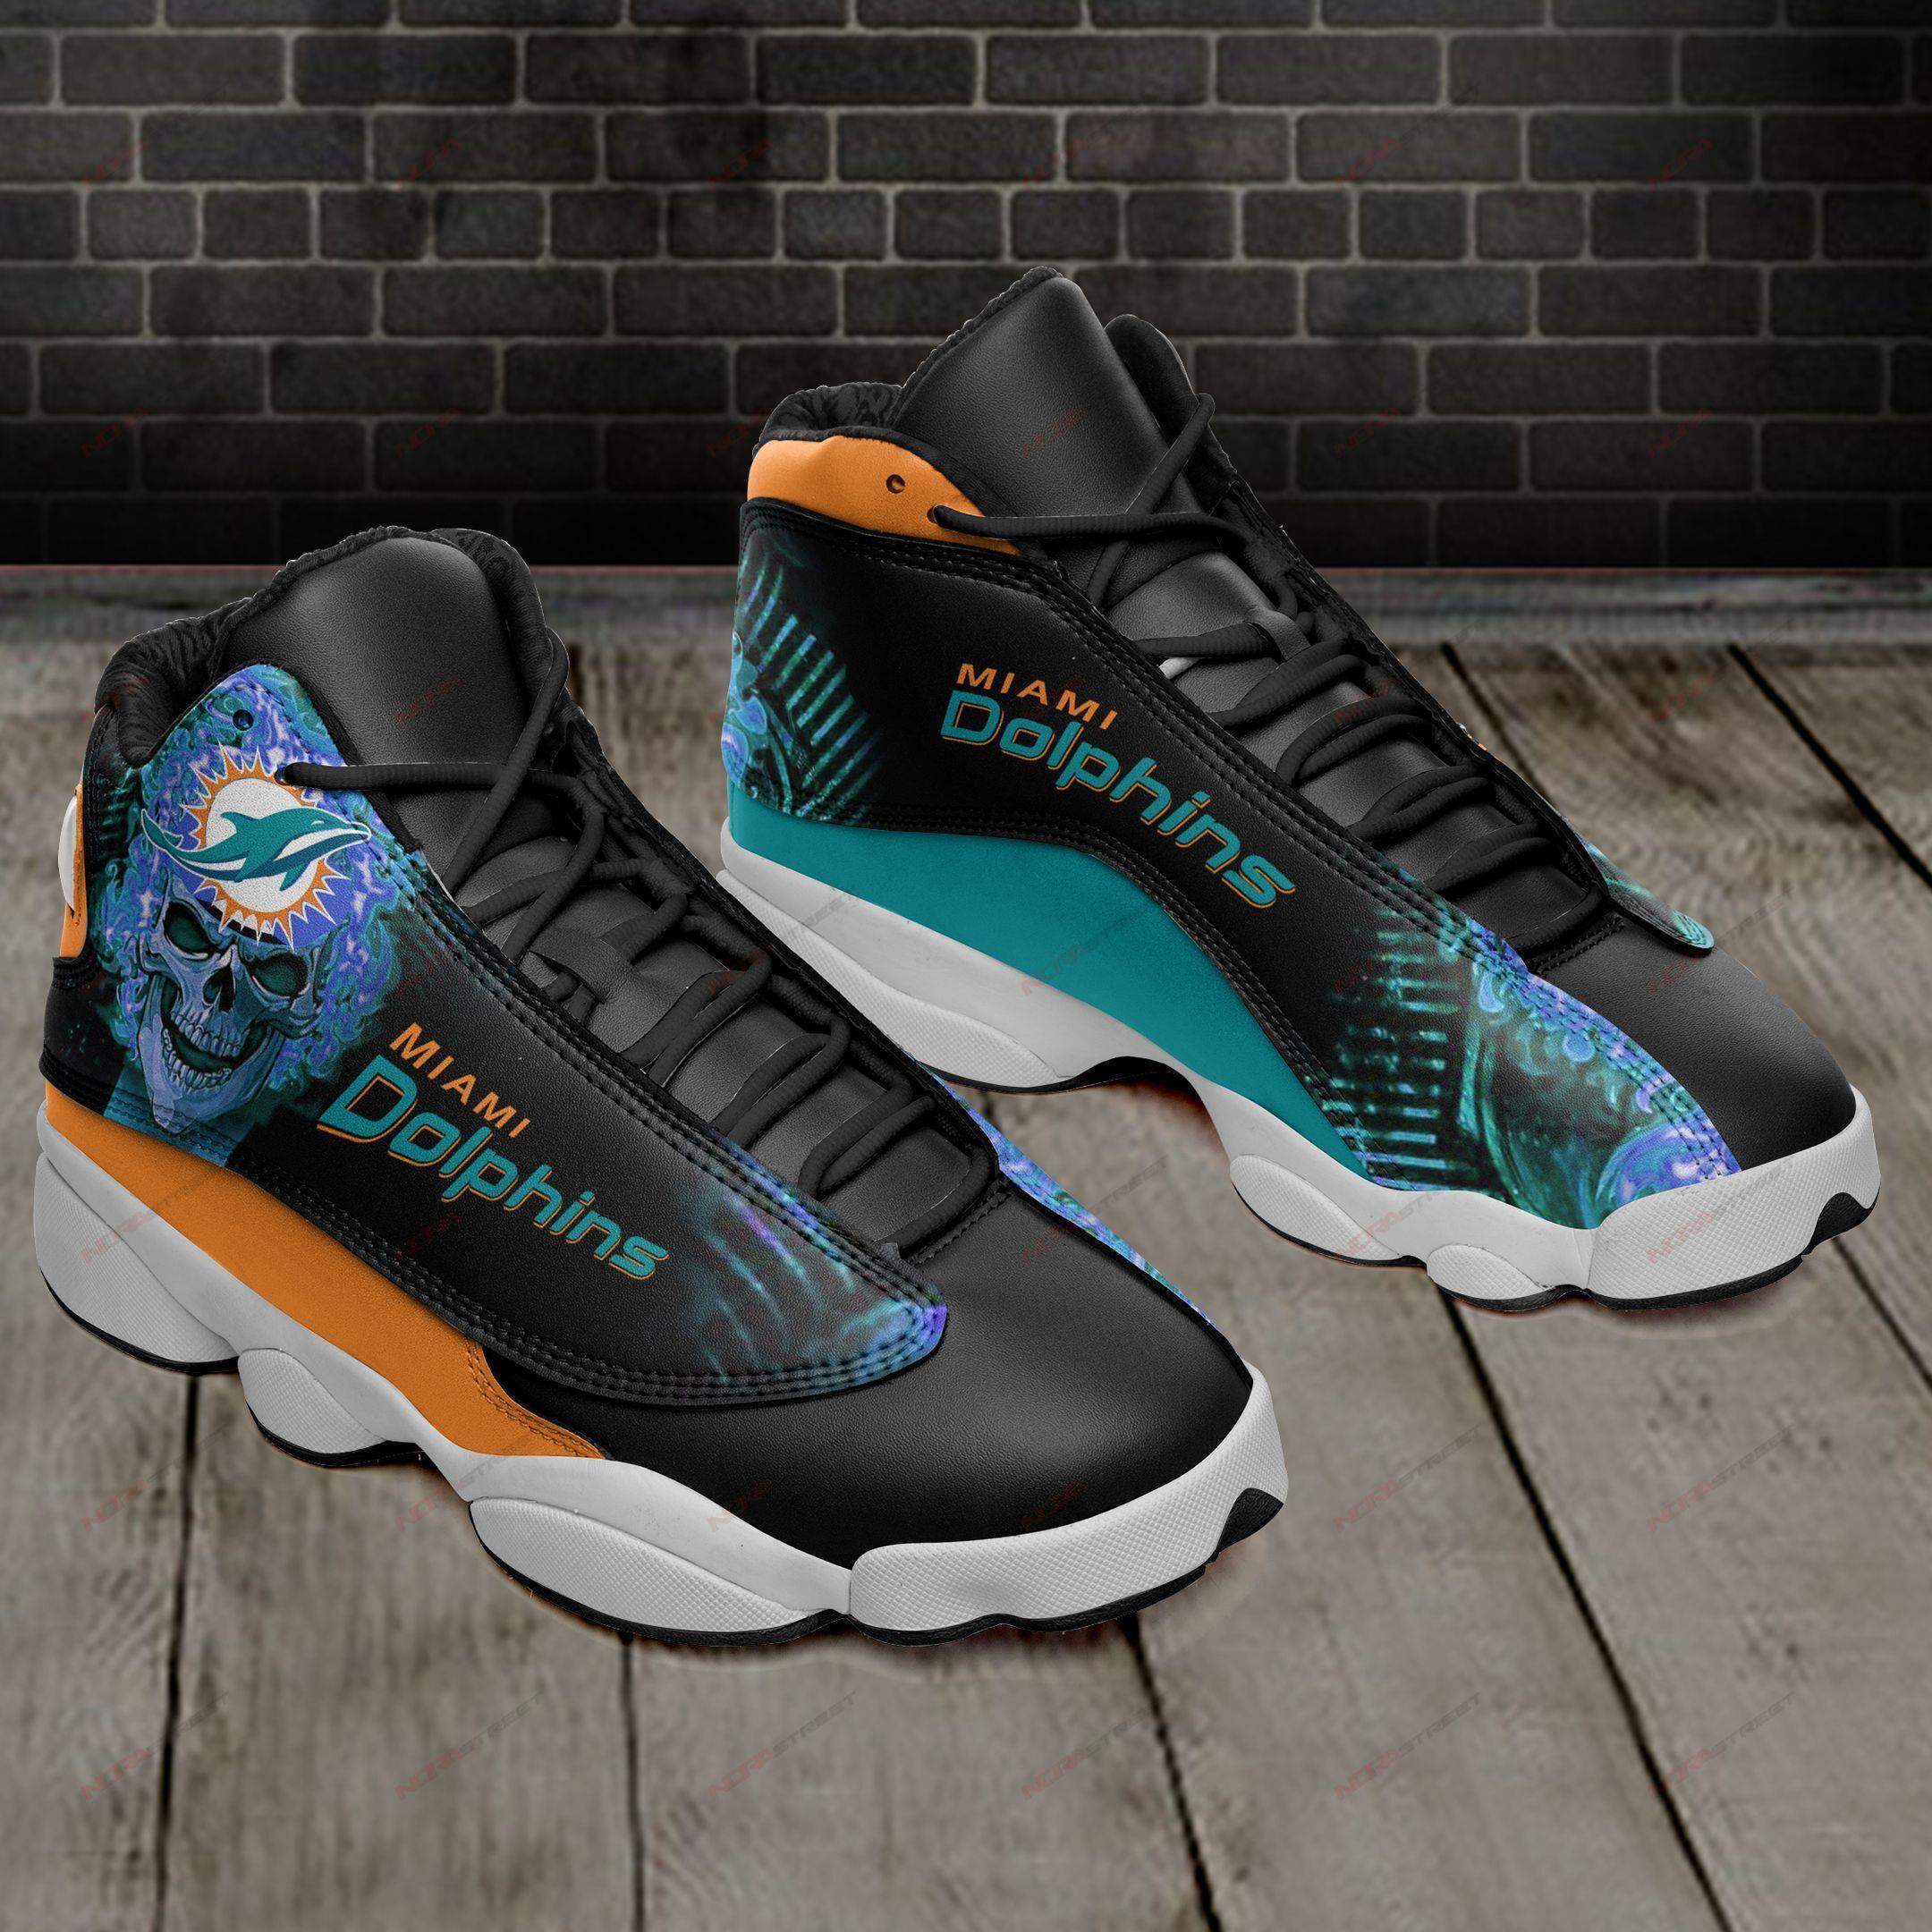 Miami Dolphins Air Jordan 13 Sneakers Sport Shoes Plus Size